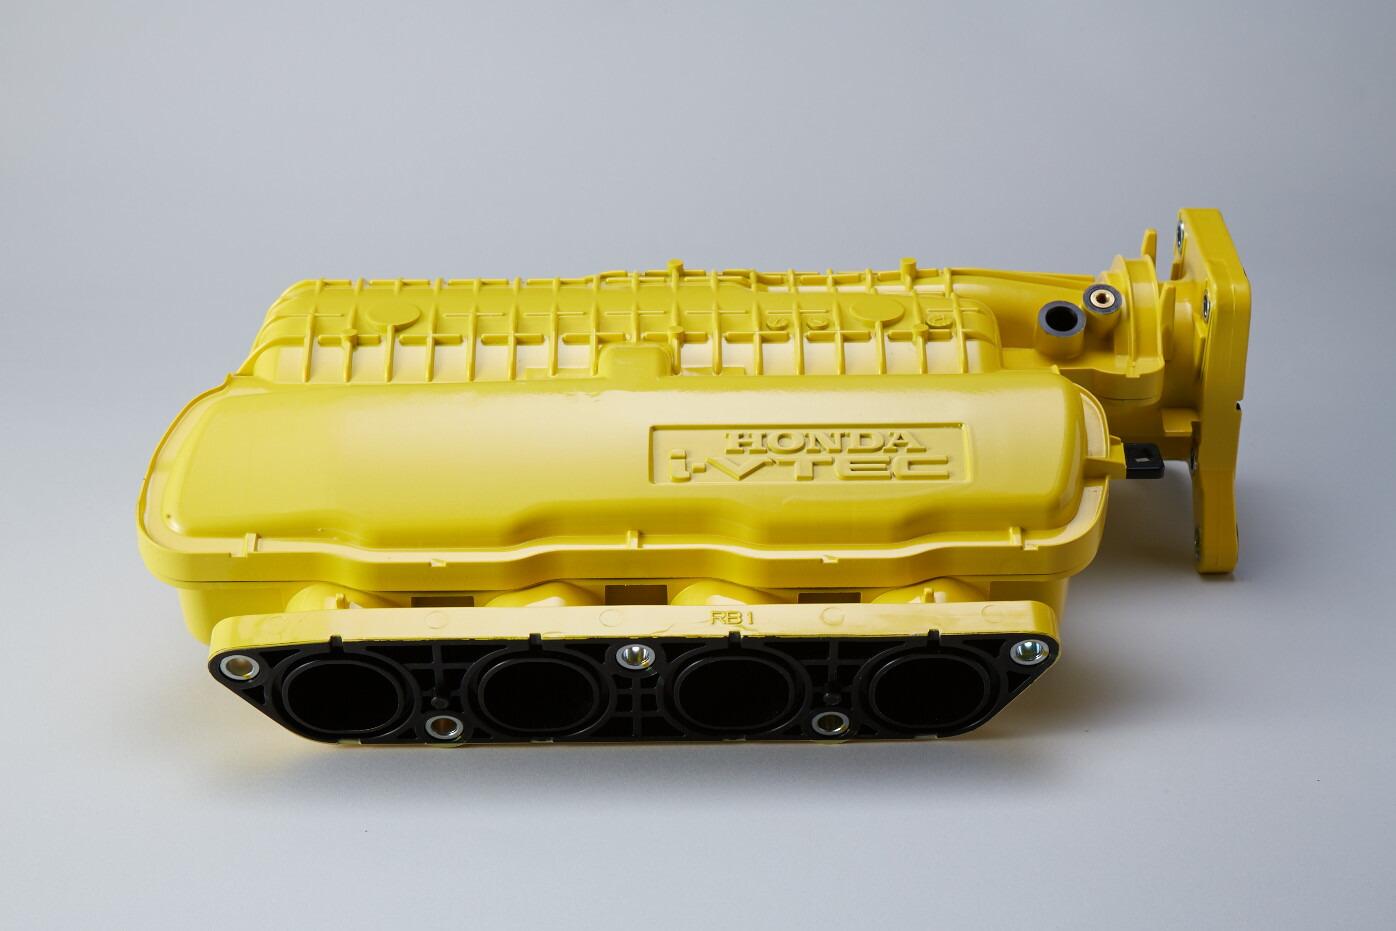 SPOON SPORTS スプーン スポーツ CR-Z ZF1 2 INTAKE CHAMBER YELLOW インテークチャンバー イエロー 17110-GE8-Y00 配送先条件有り